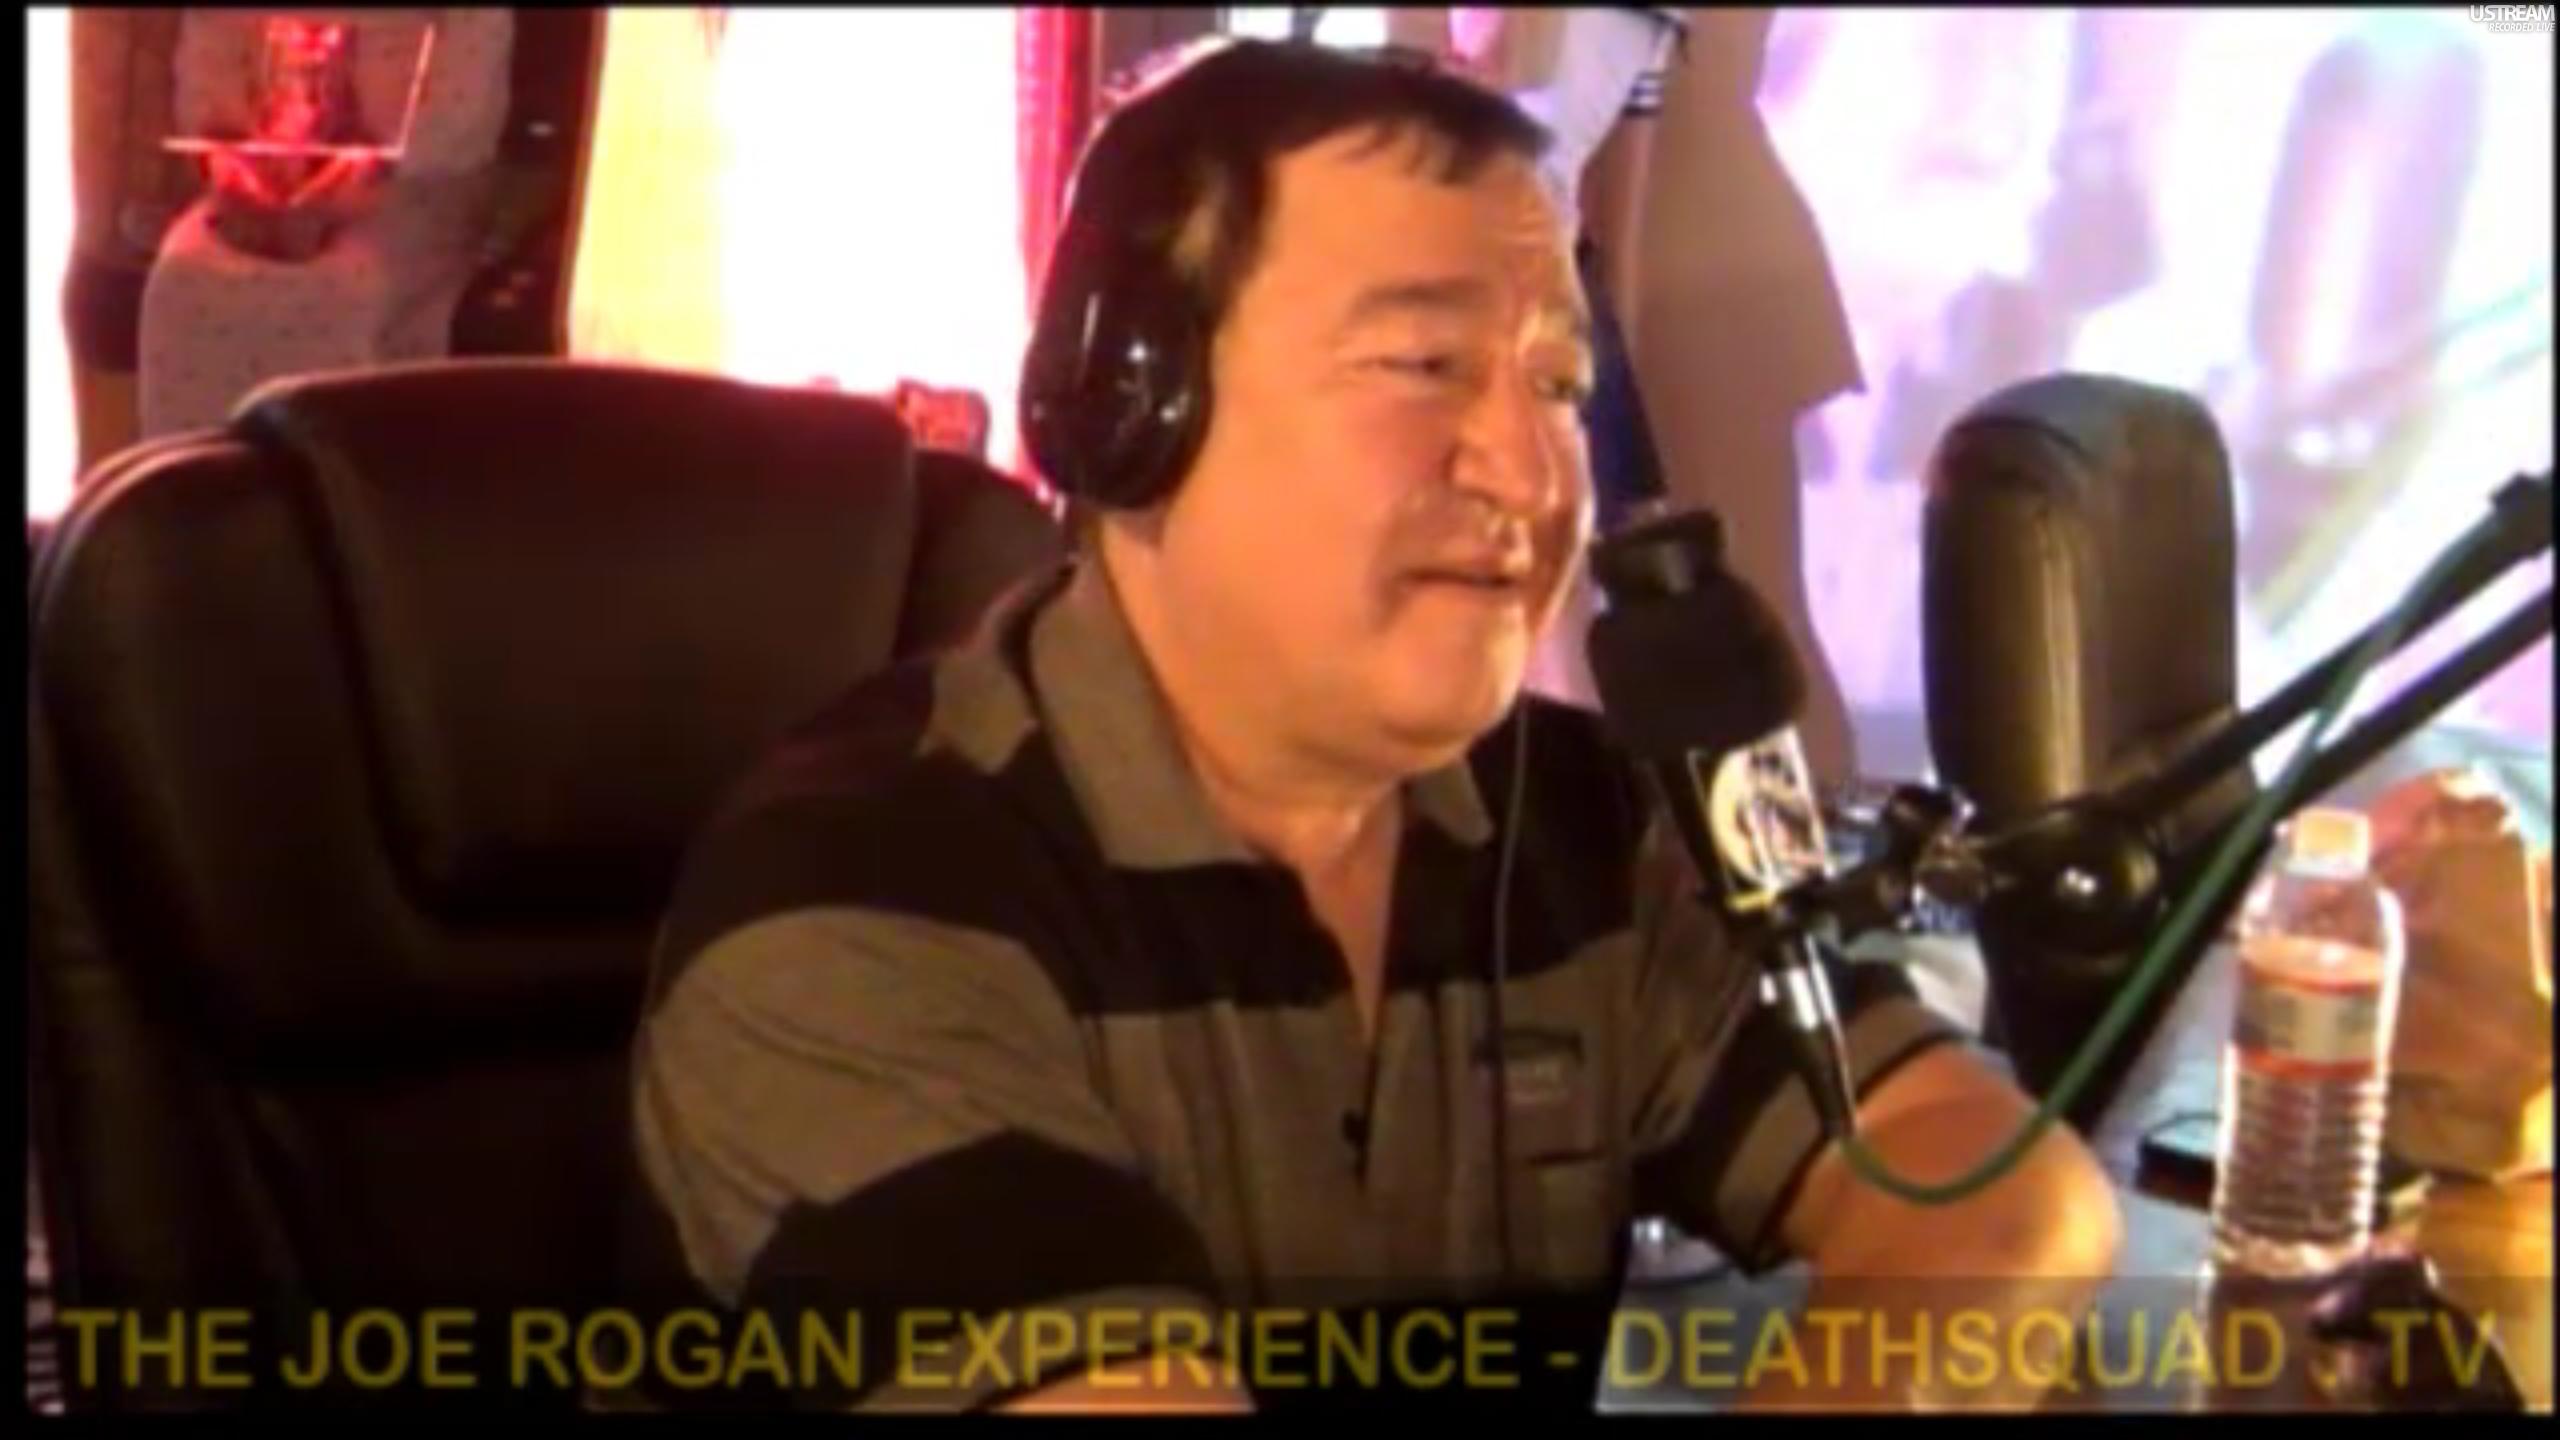 The Joe Rogan Experience #218 - Dom Irrera, Brian Redban